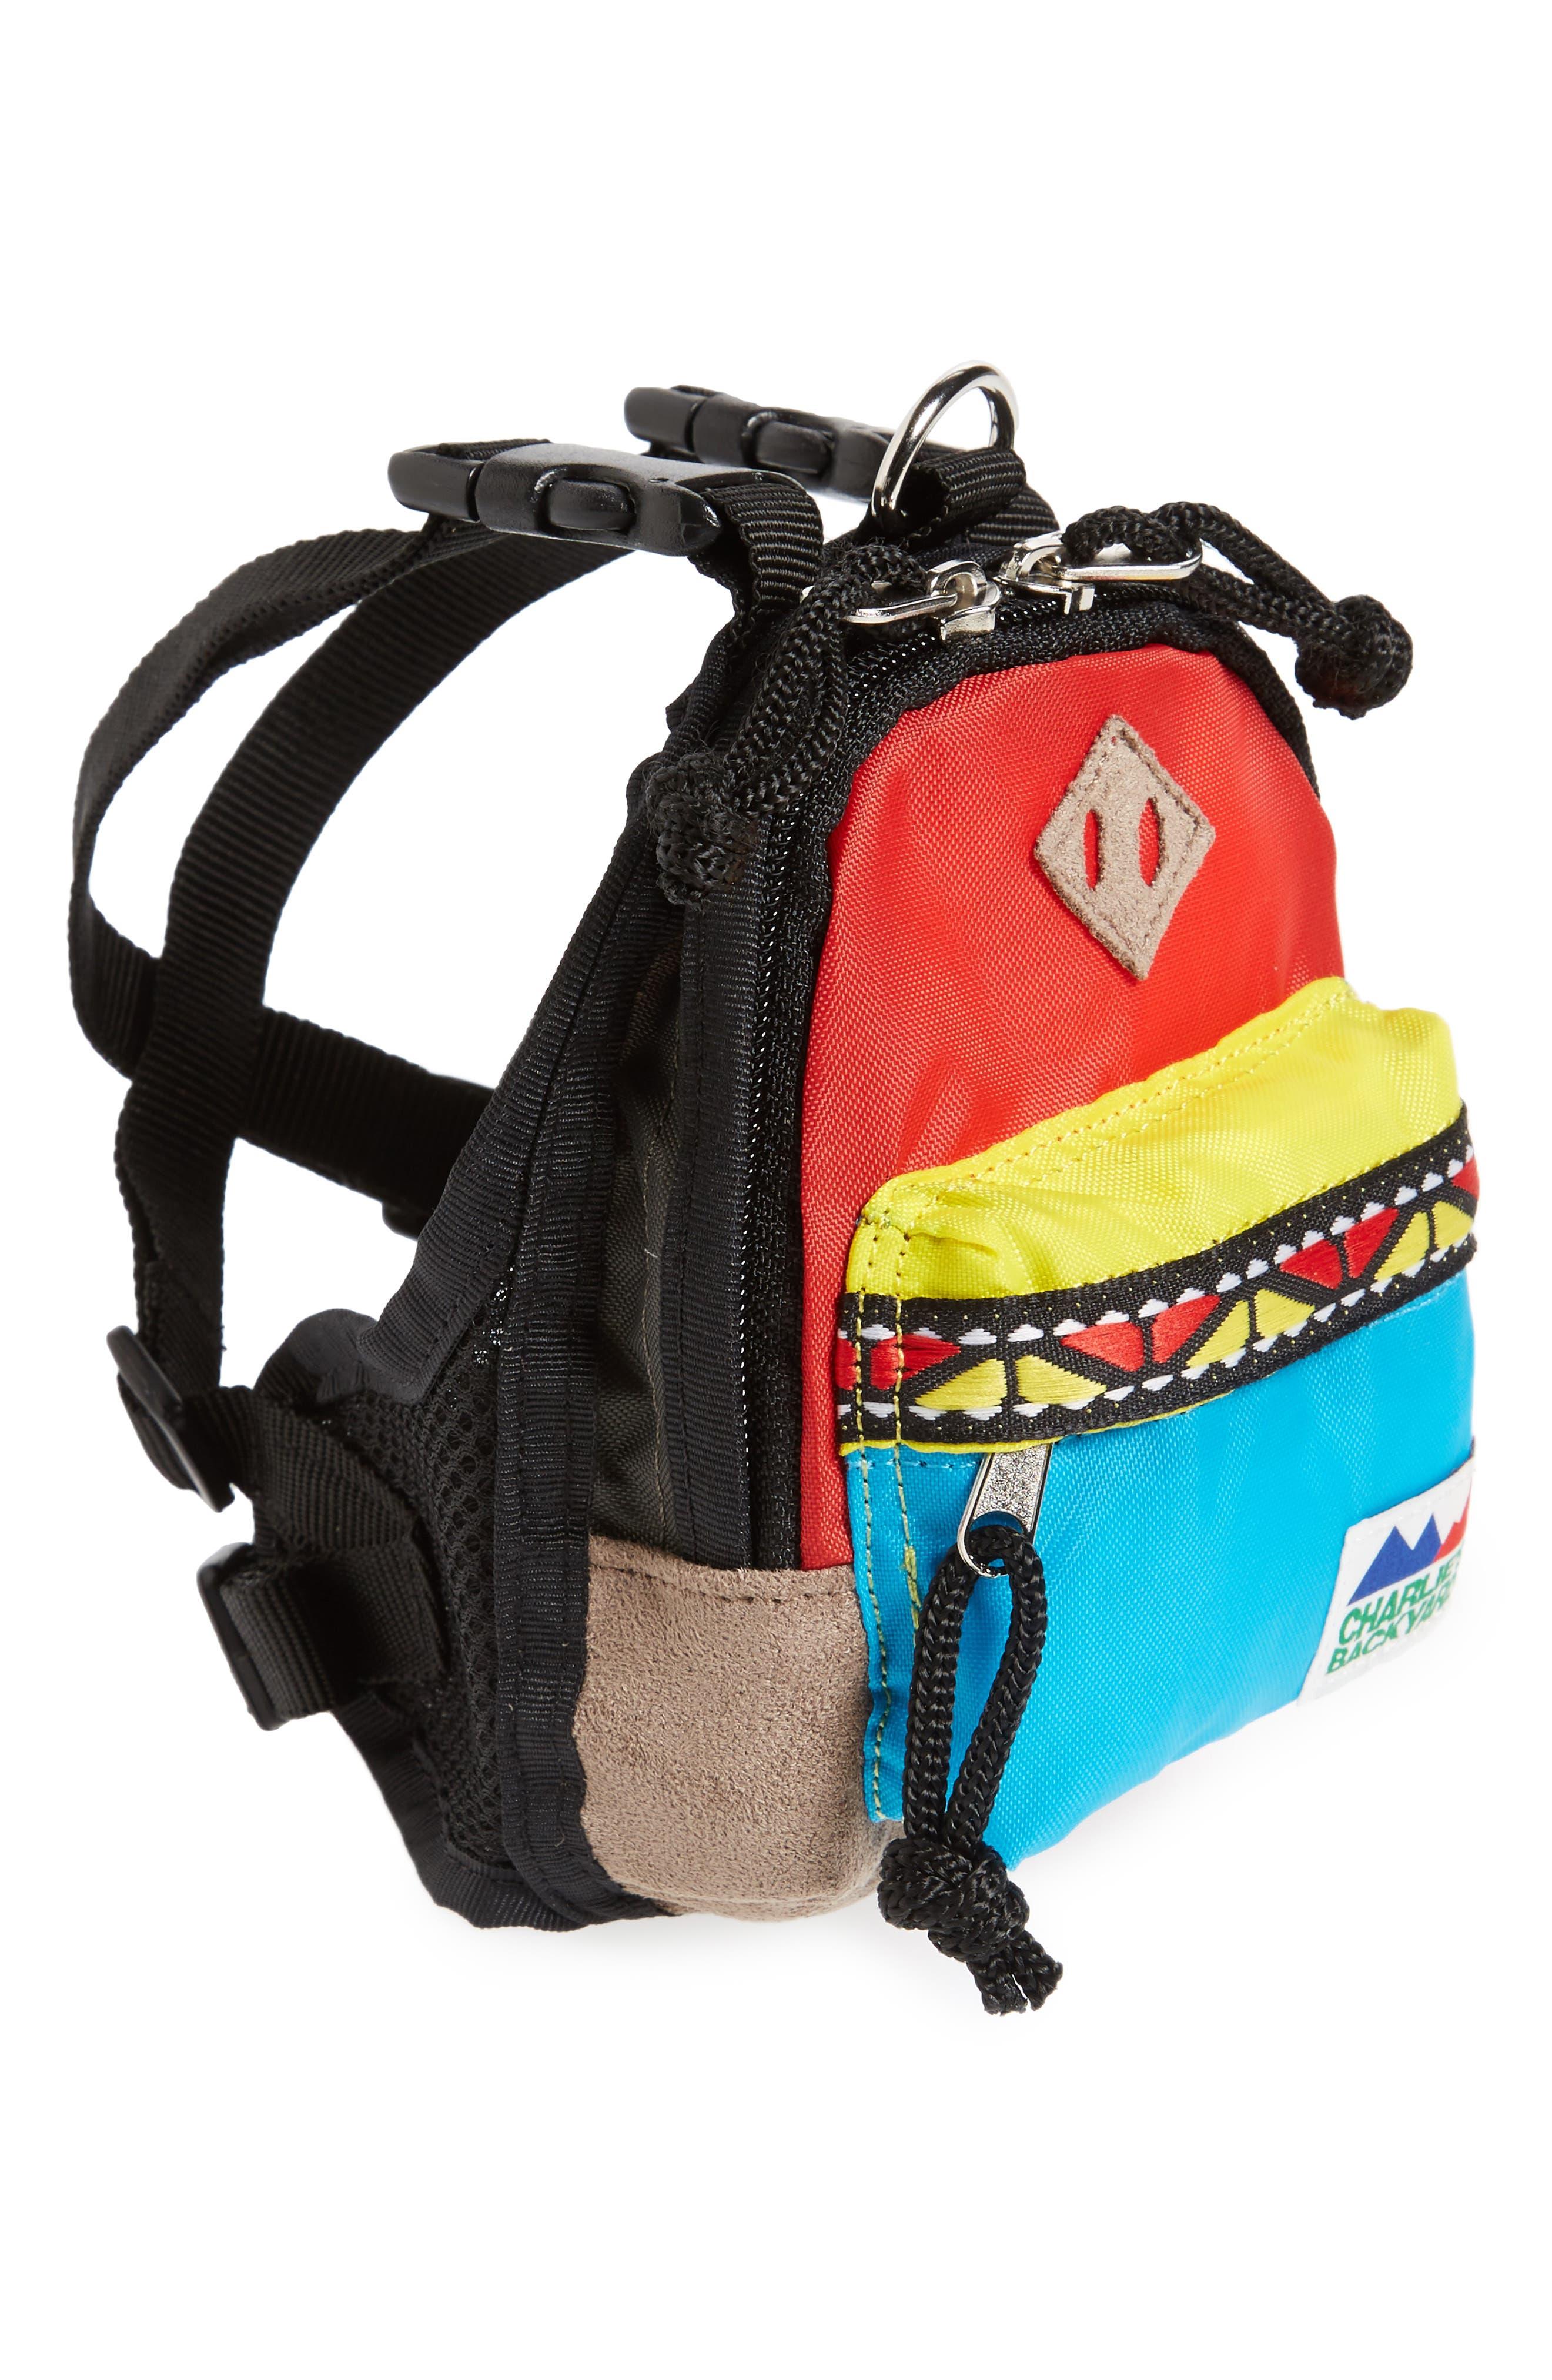 Charlie's Backyard Dog Backpack